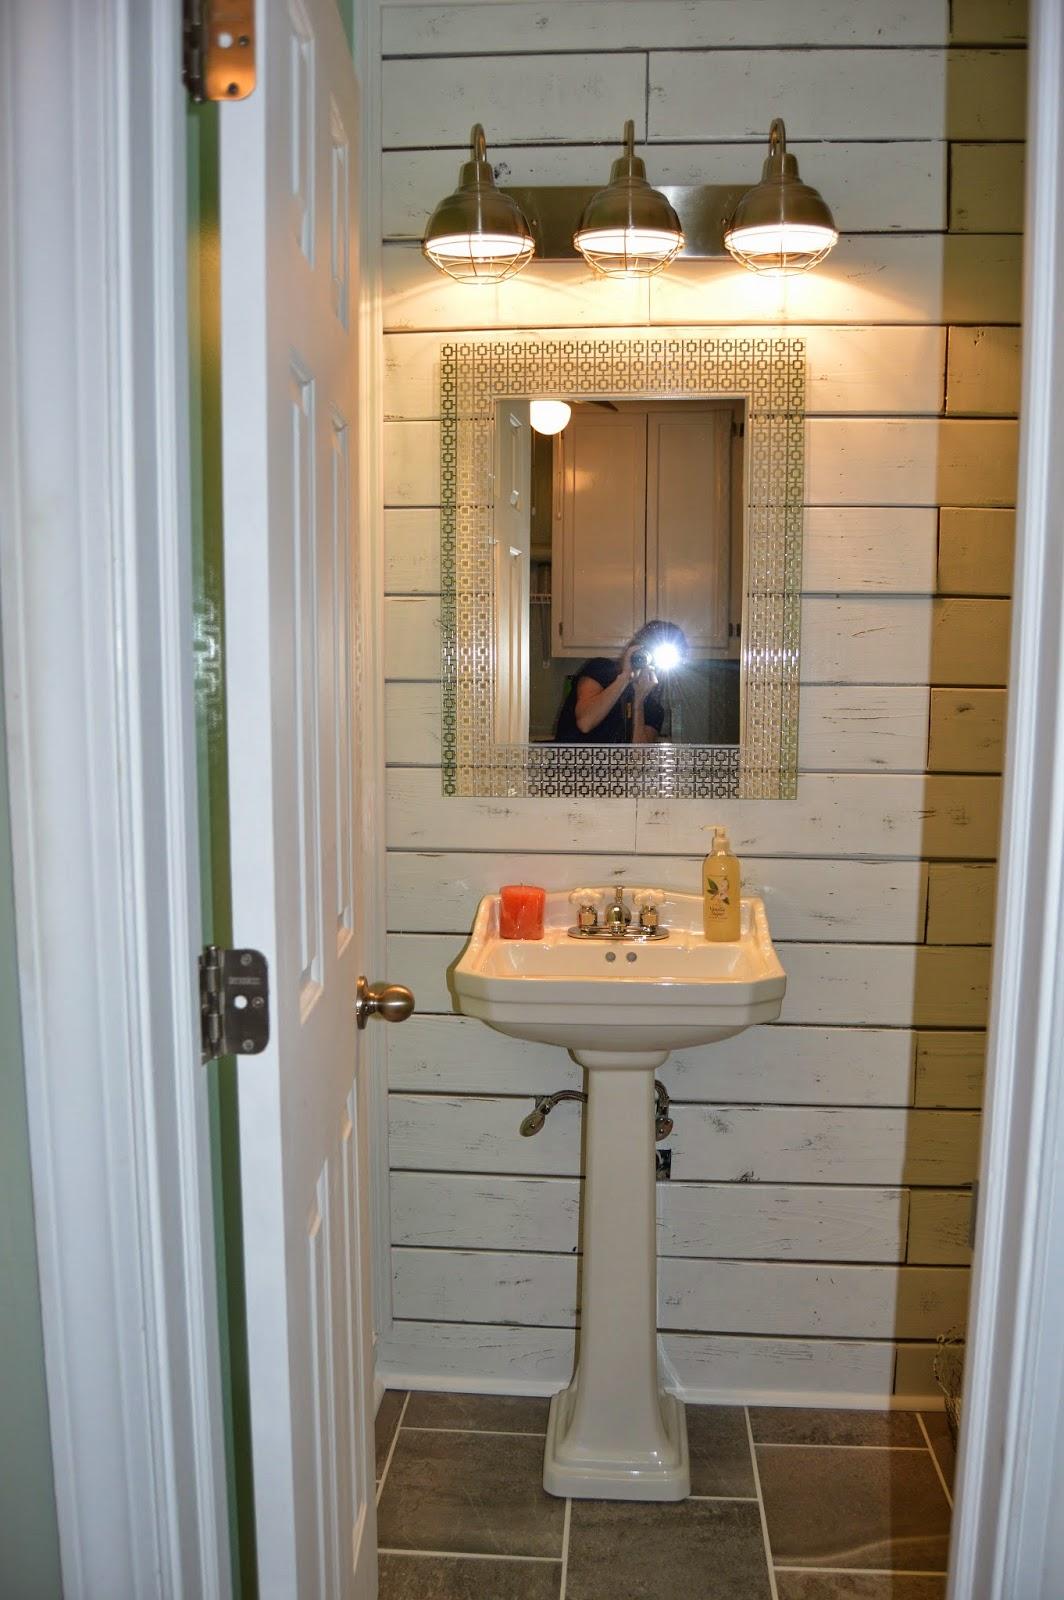 Popular Vanity Light Shades of Light Pedestal Sink Home Depot faucet Amazon Tile Lowe us